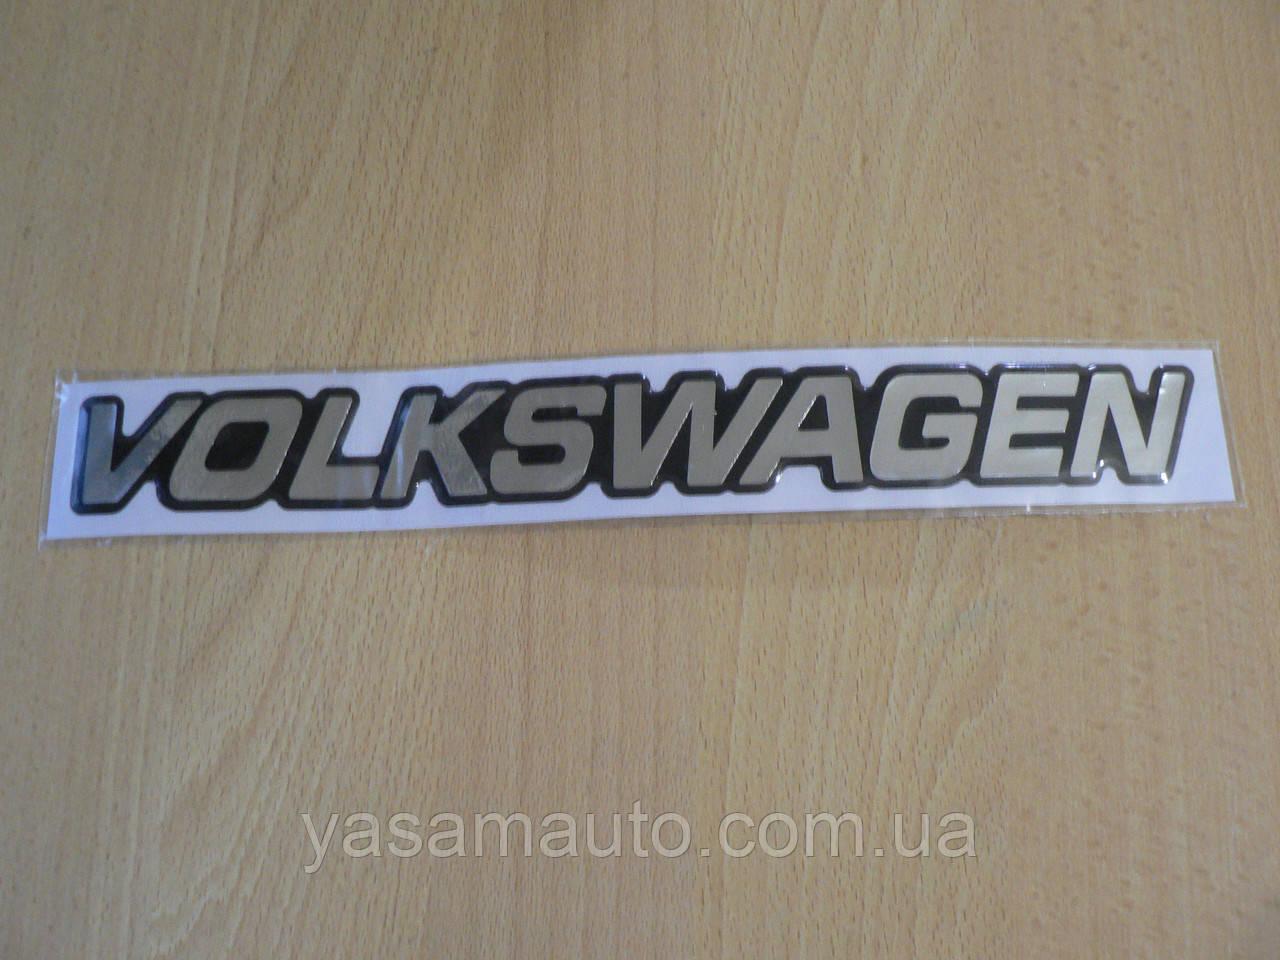 Наклейка s орнамент задний Volkswagen 302х34х1.2мм №1 S силиконовая на микроавтобус надпись авто Волксваген